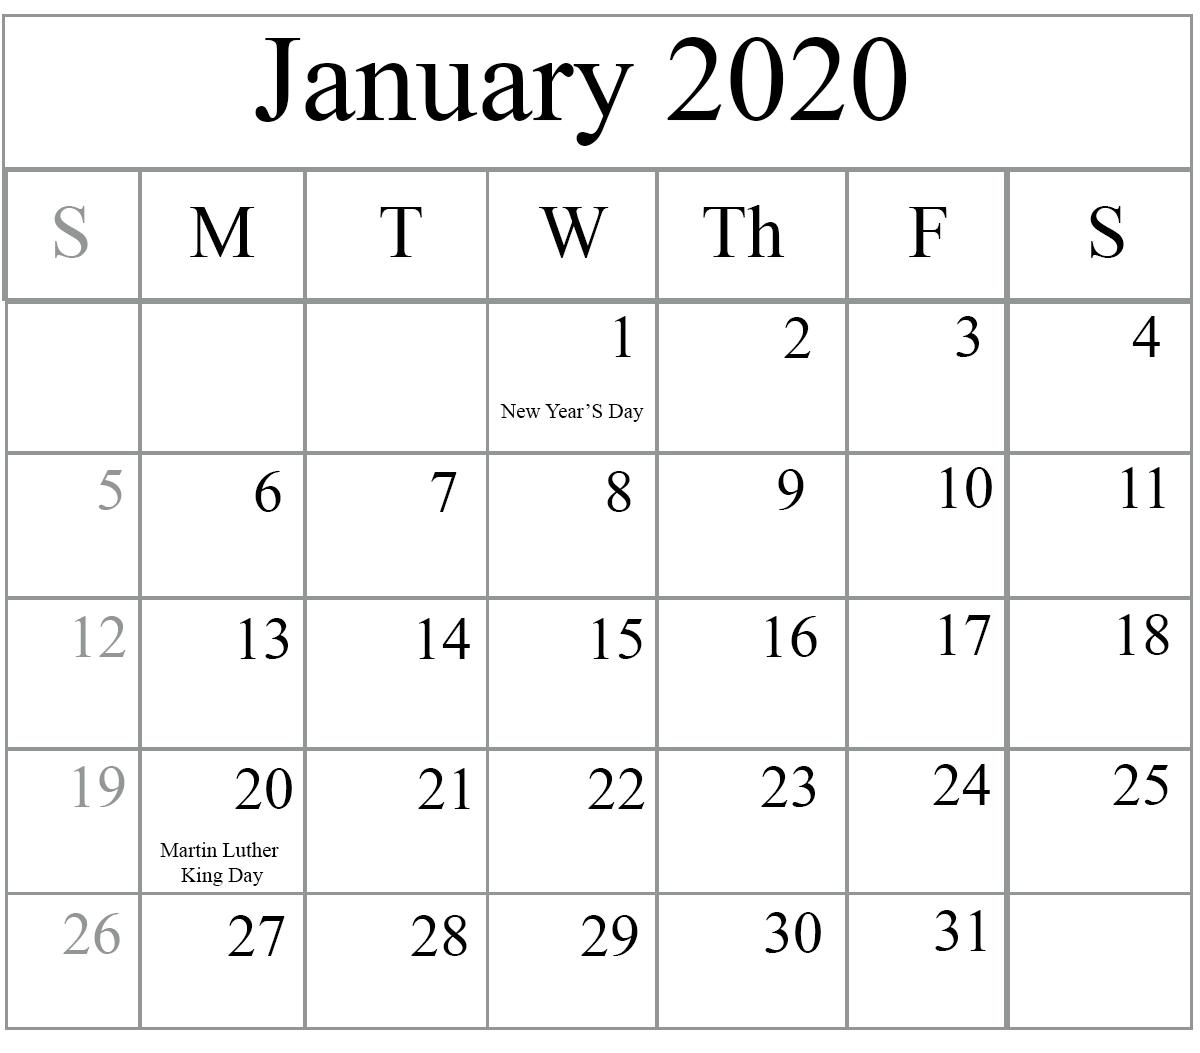 Free January 2020 Printable Calendar In Pdf, Excel & Word-January 2020 Calendar Canada Printable